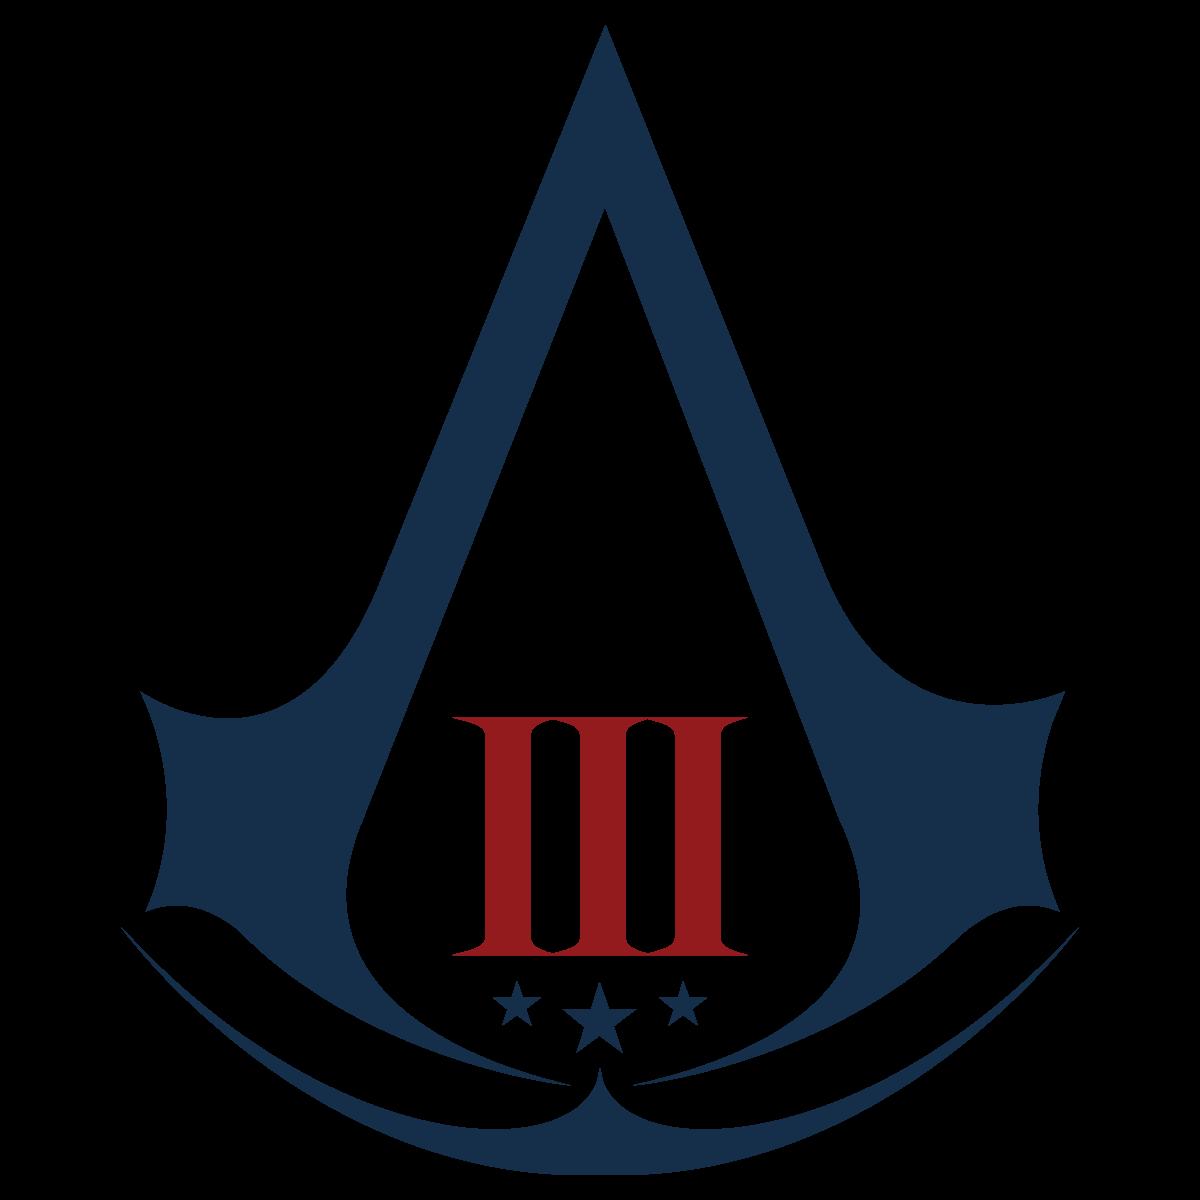 Assassin-s creed 3 logo clipart clip art free Assassins Creed 3 Icon Symbol Logo Vector | Free Vector Silhouette ... clip art free